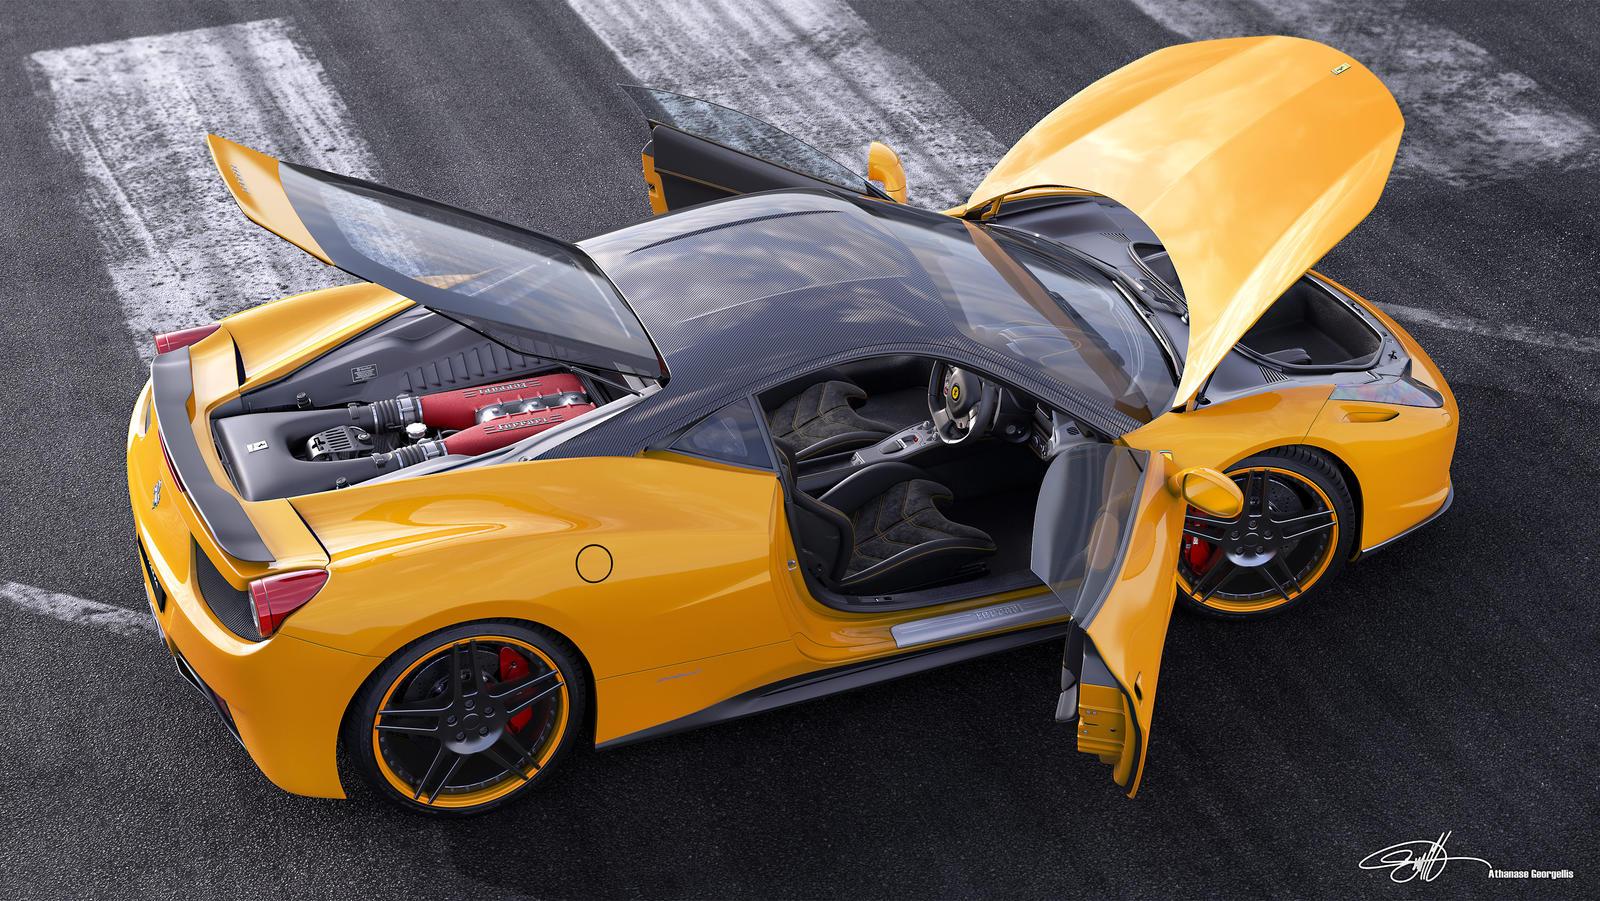 Ferrari_458italia_NovitecRosso_Runway_Yellow by NasG85